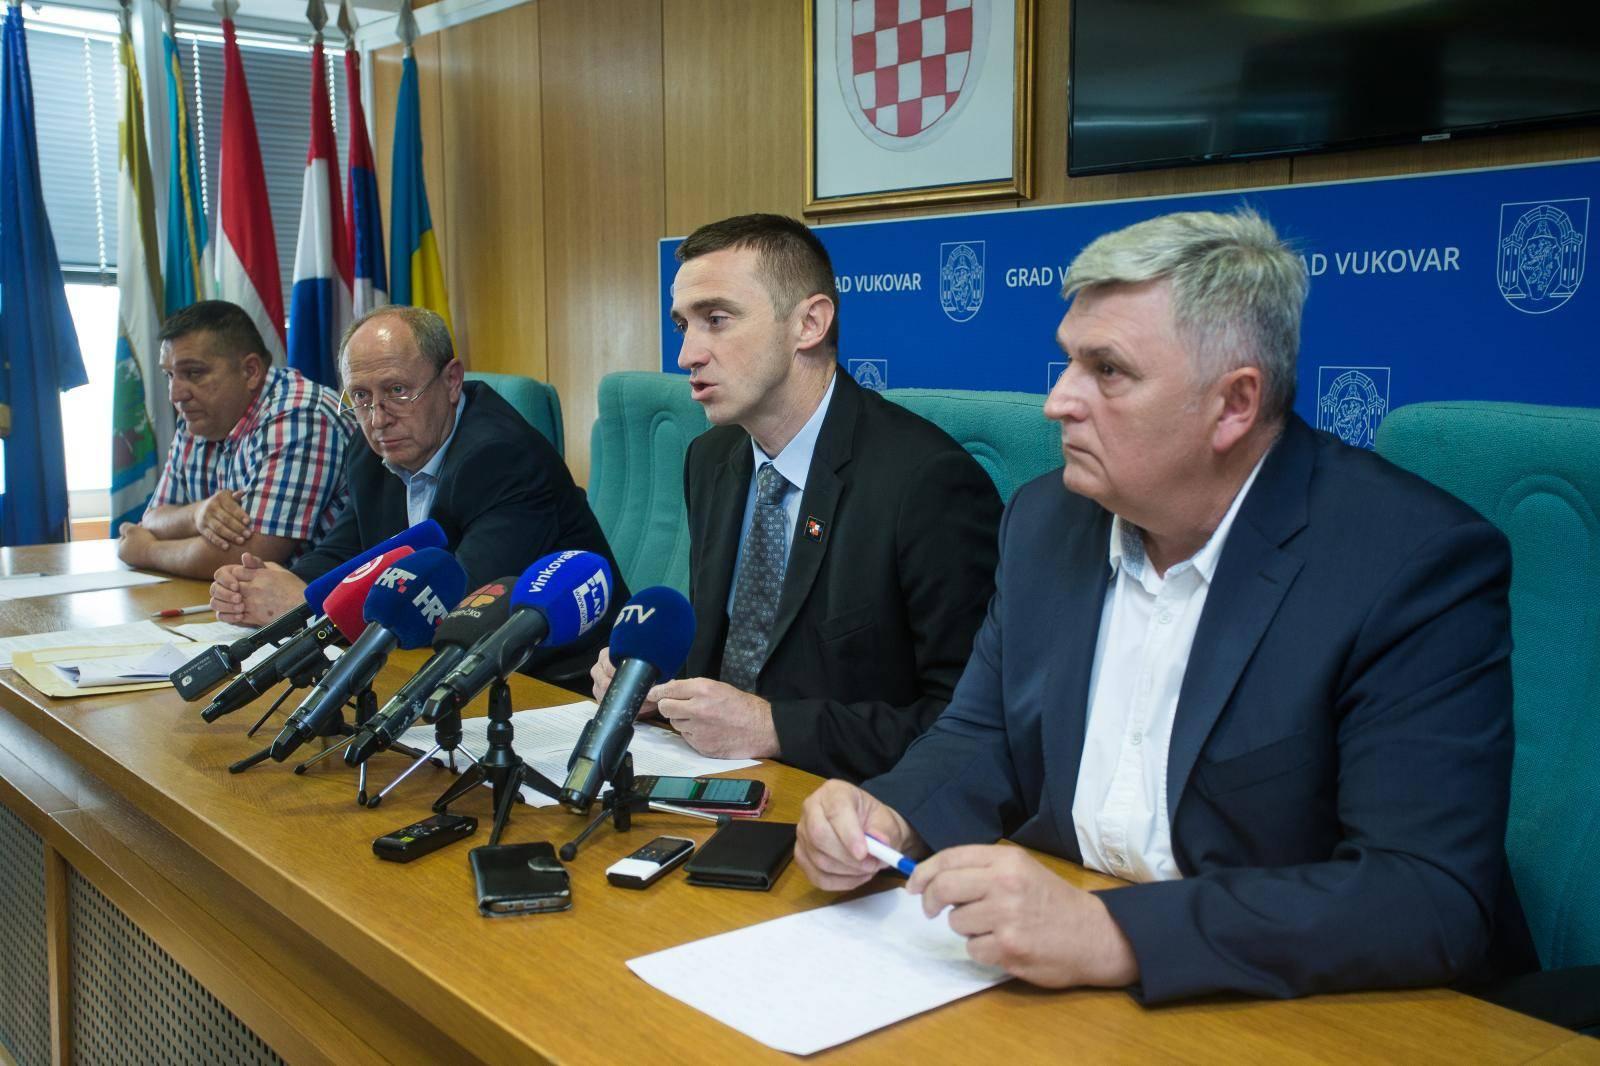 Vukovarski gradonačelnik Ivan Penava na konferenciji za novinare govorio je o odluci Ustavnog suda